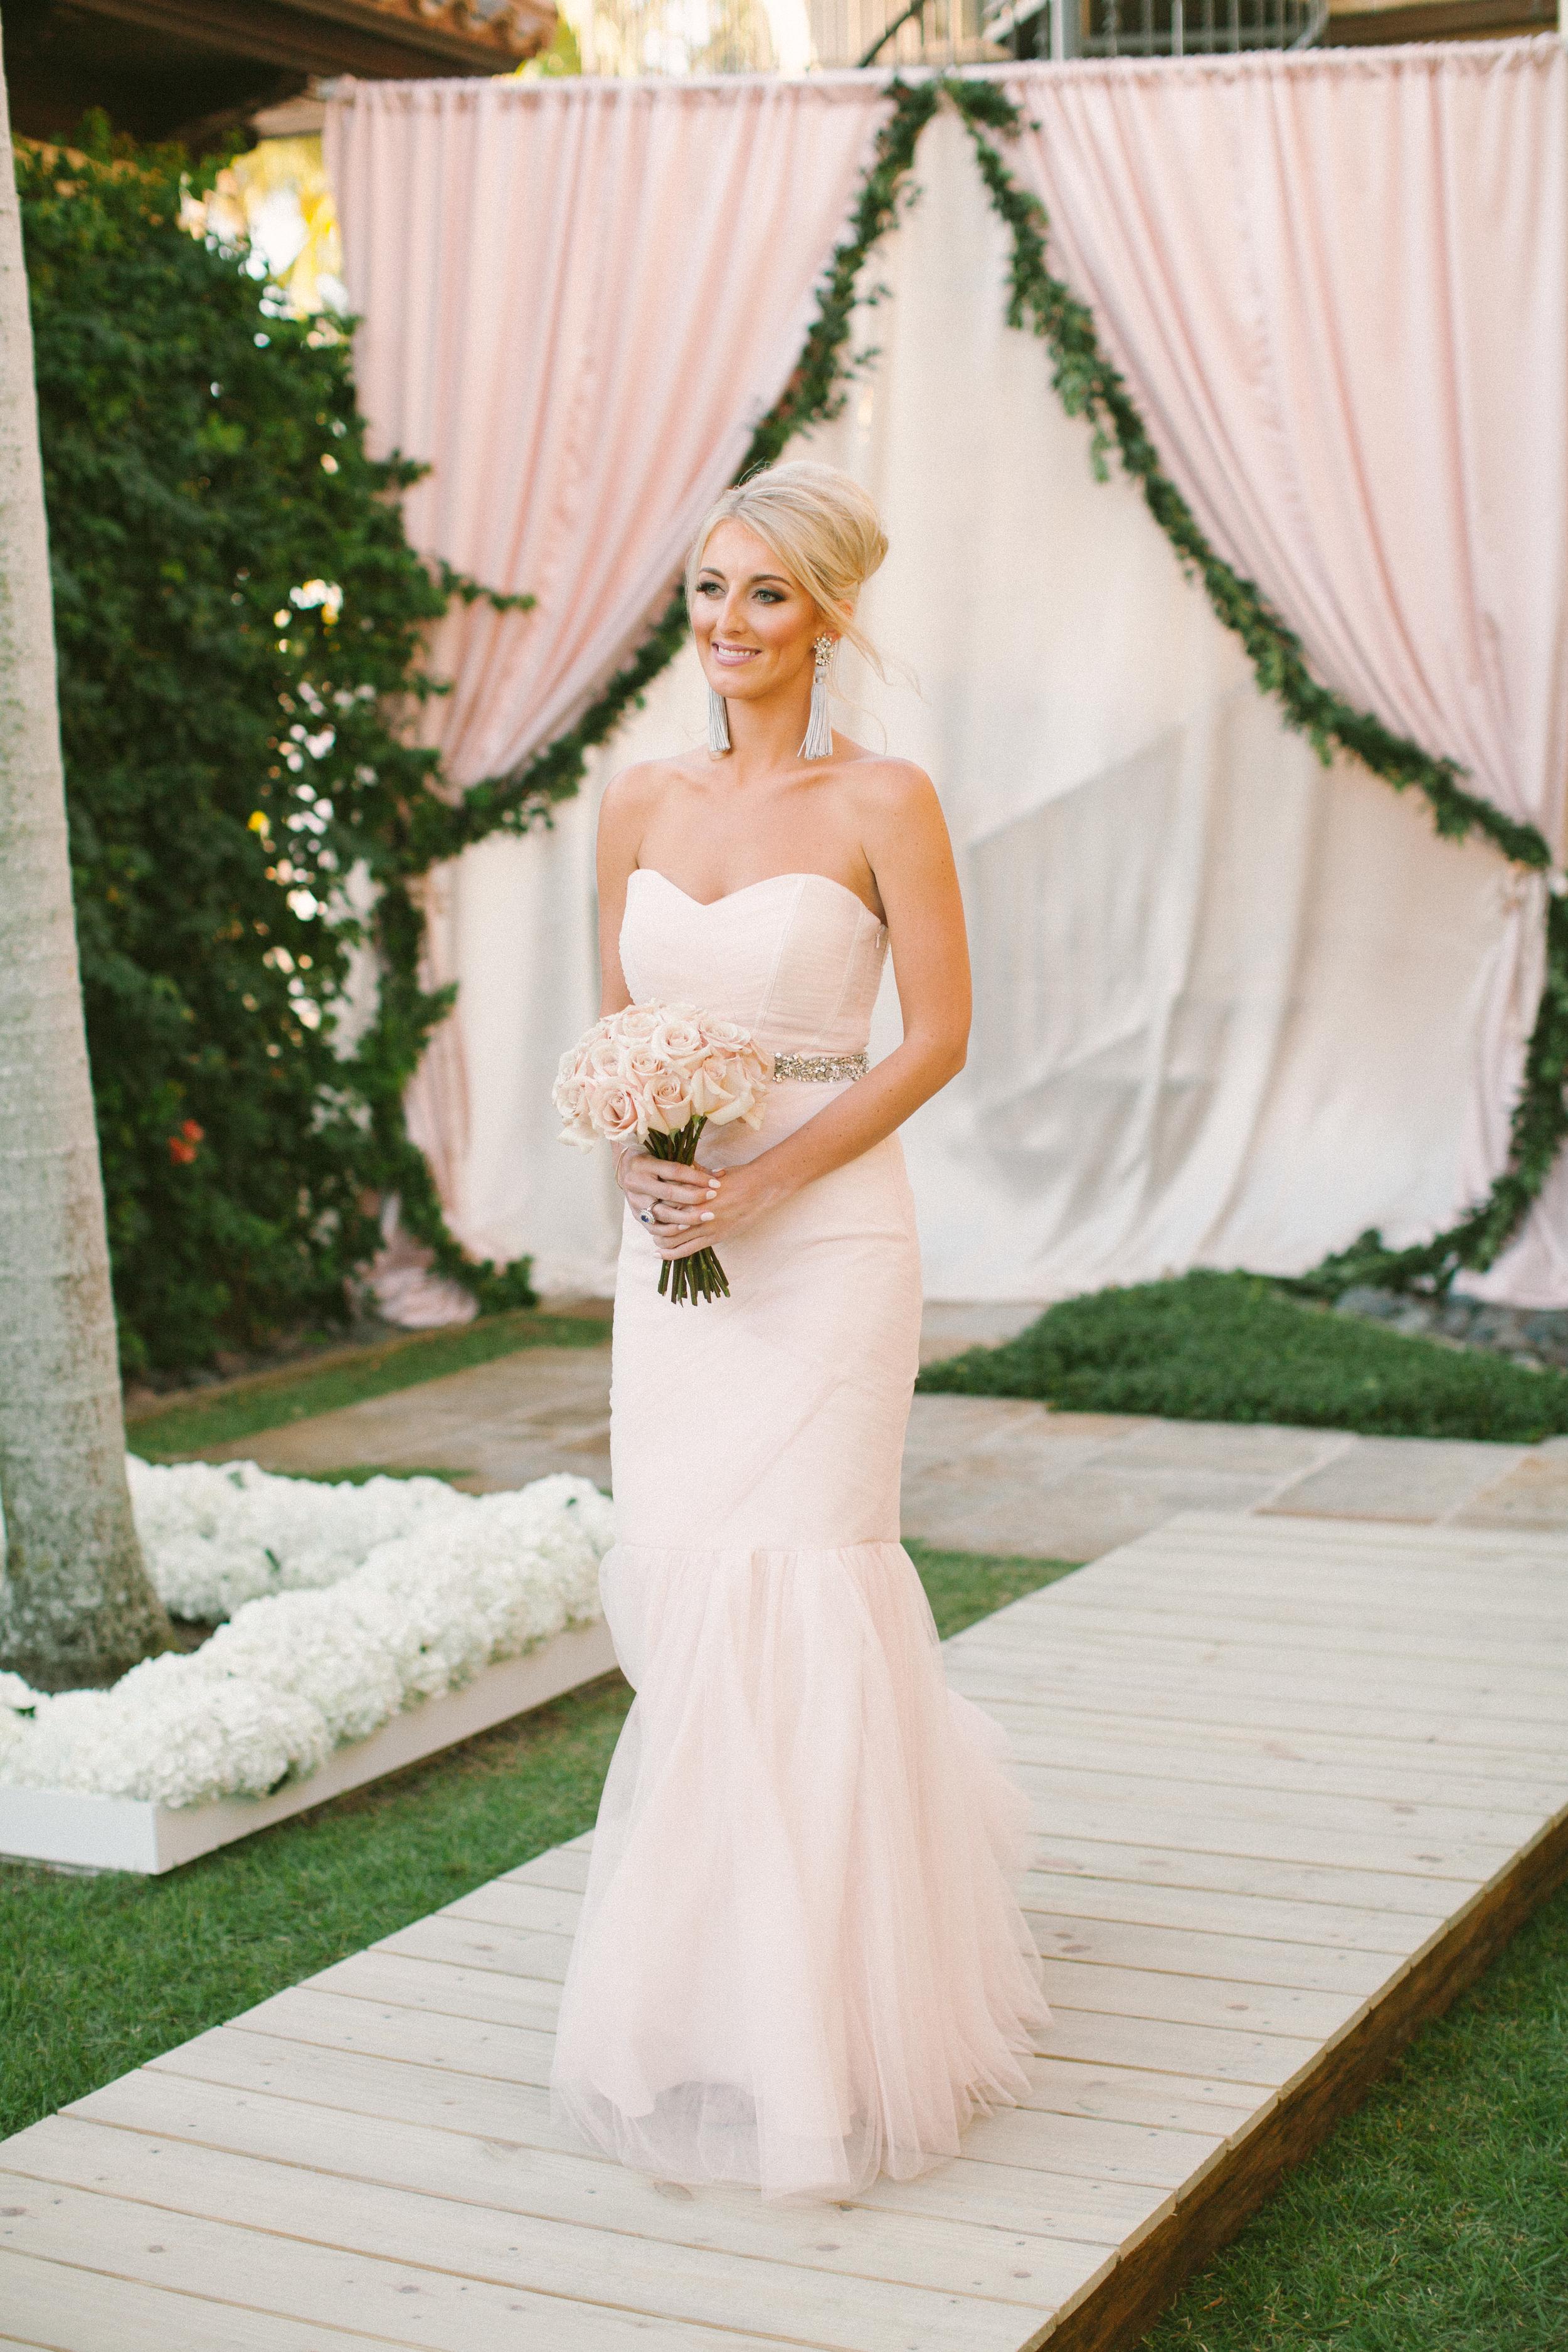 Ceci_New_York_Florida_Wedding_Style_Bride_Watercolor_Real_Custom_Luxury_66.jpg